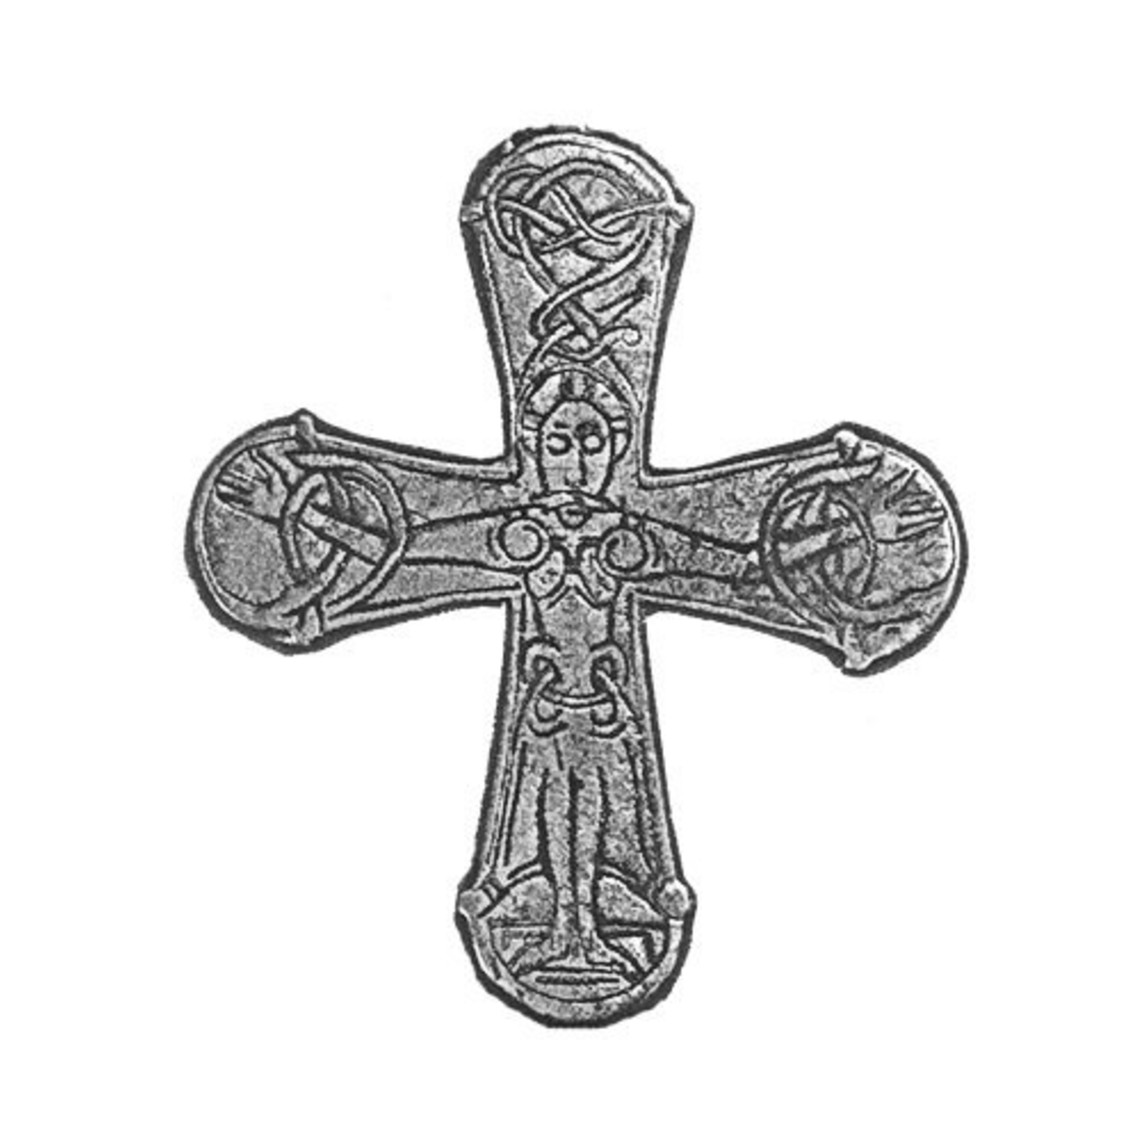 Gatebo vichingo croce, argentato